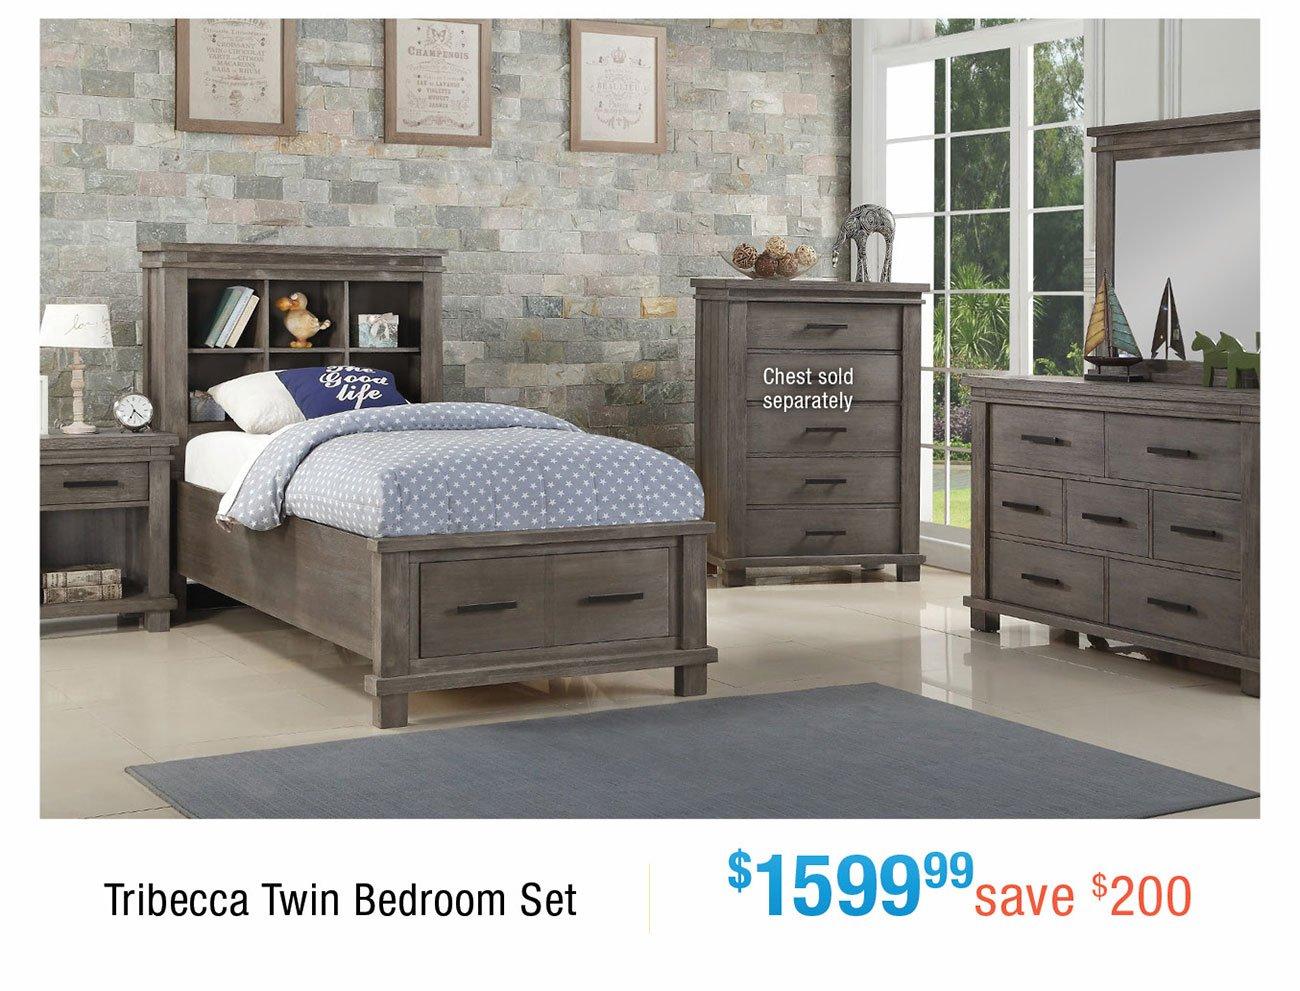 Tribecca-twin-bedroom-set